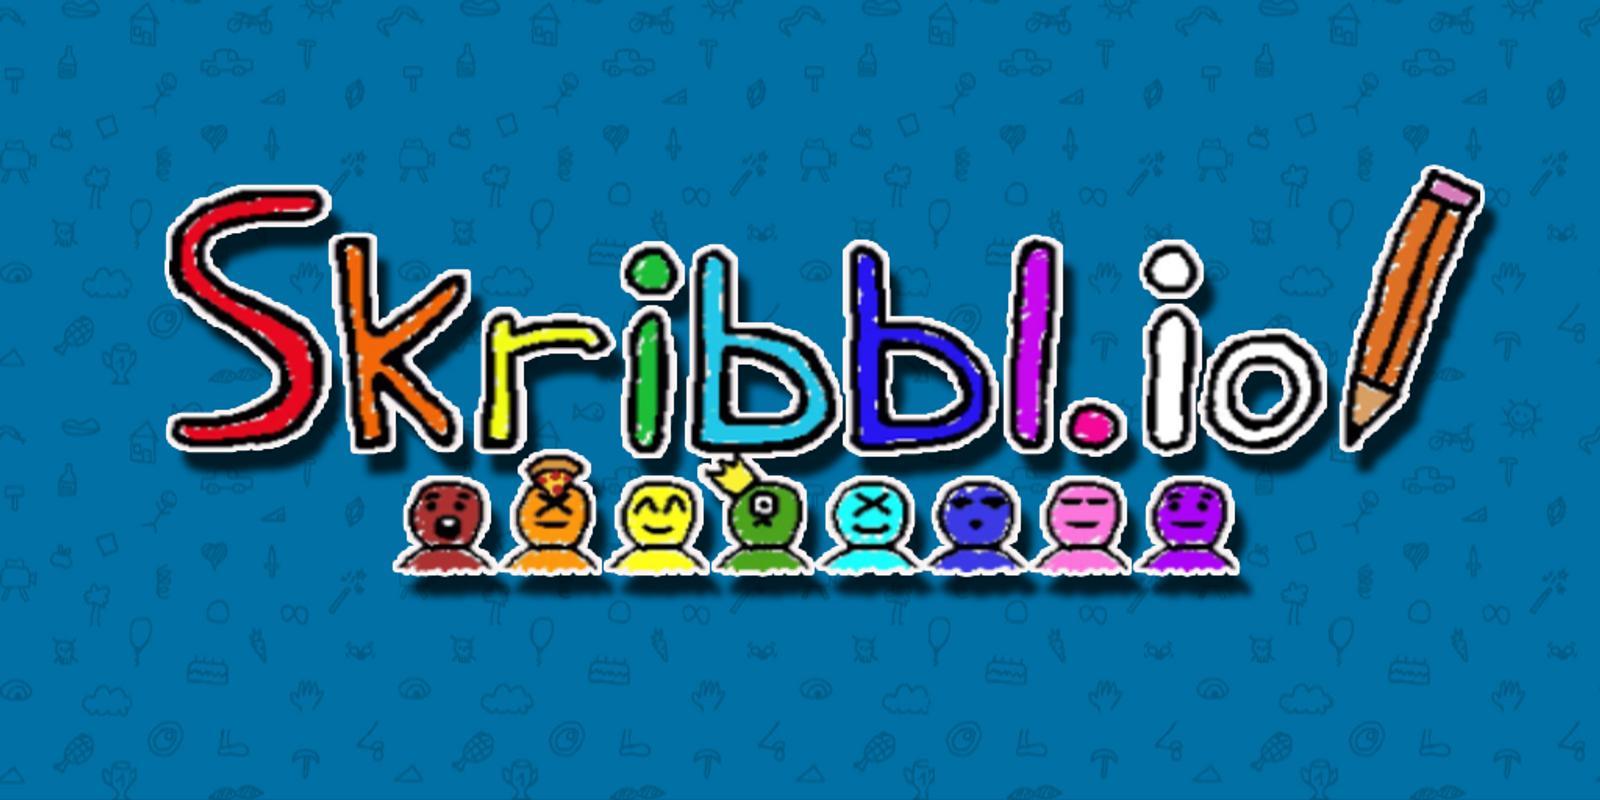 Skirbble Io